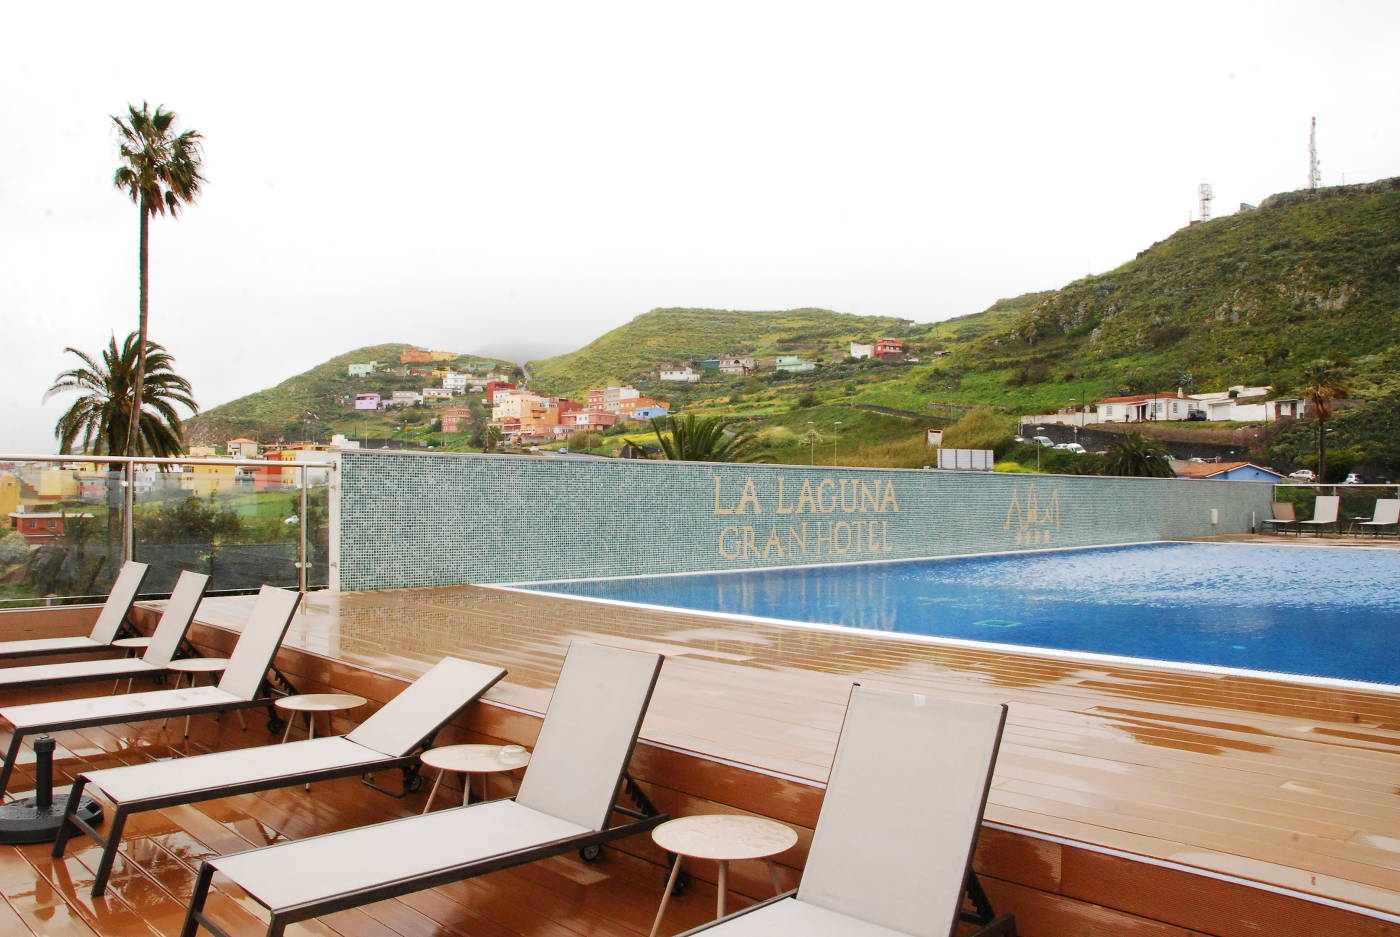 Piscine de La Laguna Gran Hotel à Tenerife